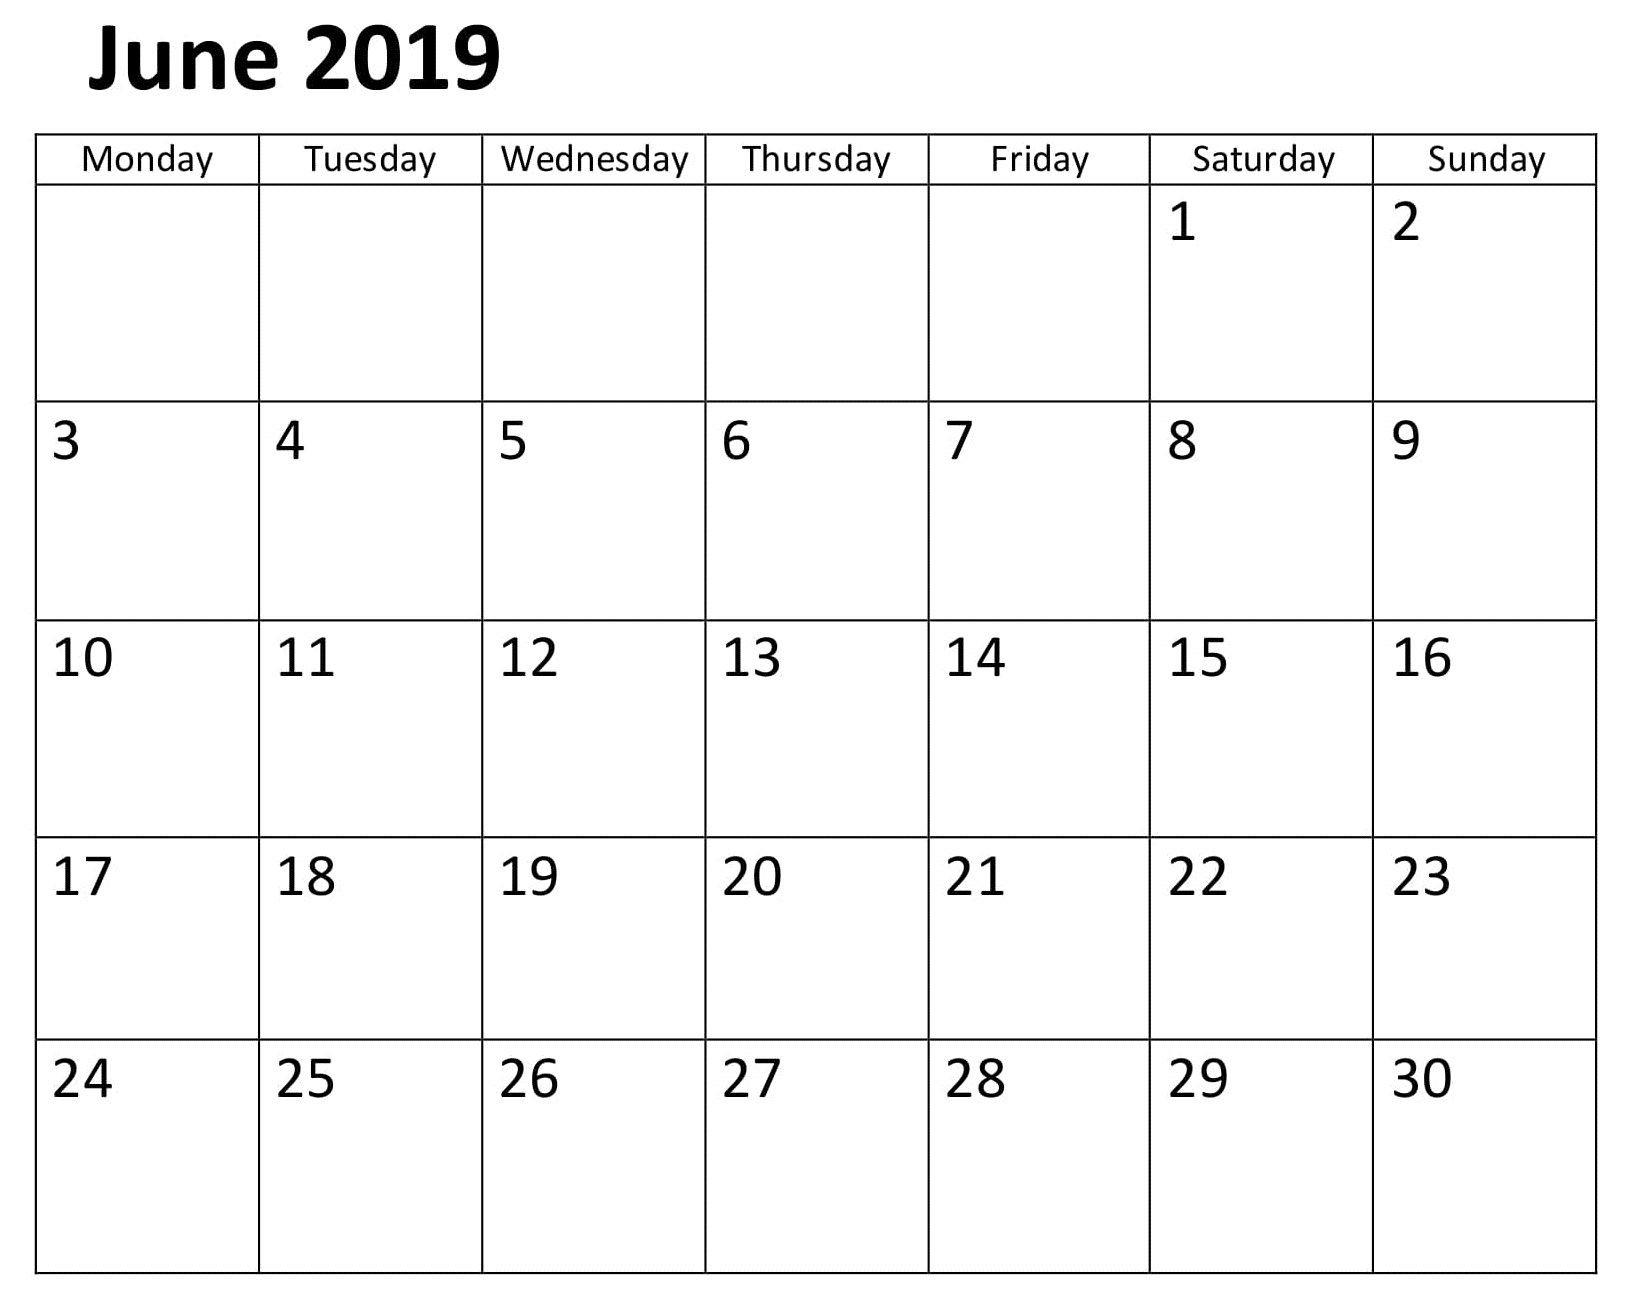 Calendar June 2019 Template Word   Calendar June 2019   Calendar Calendar 2019 Template Word